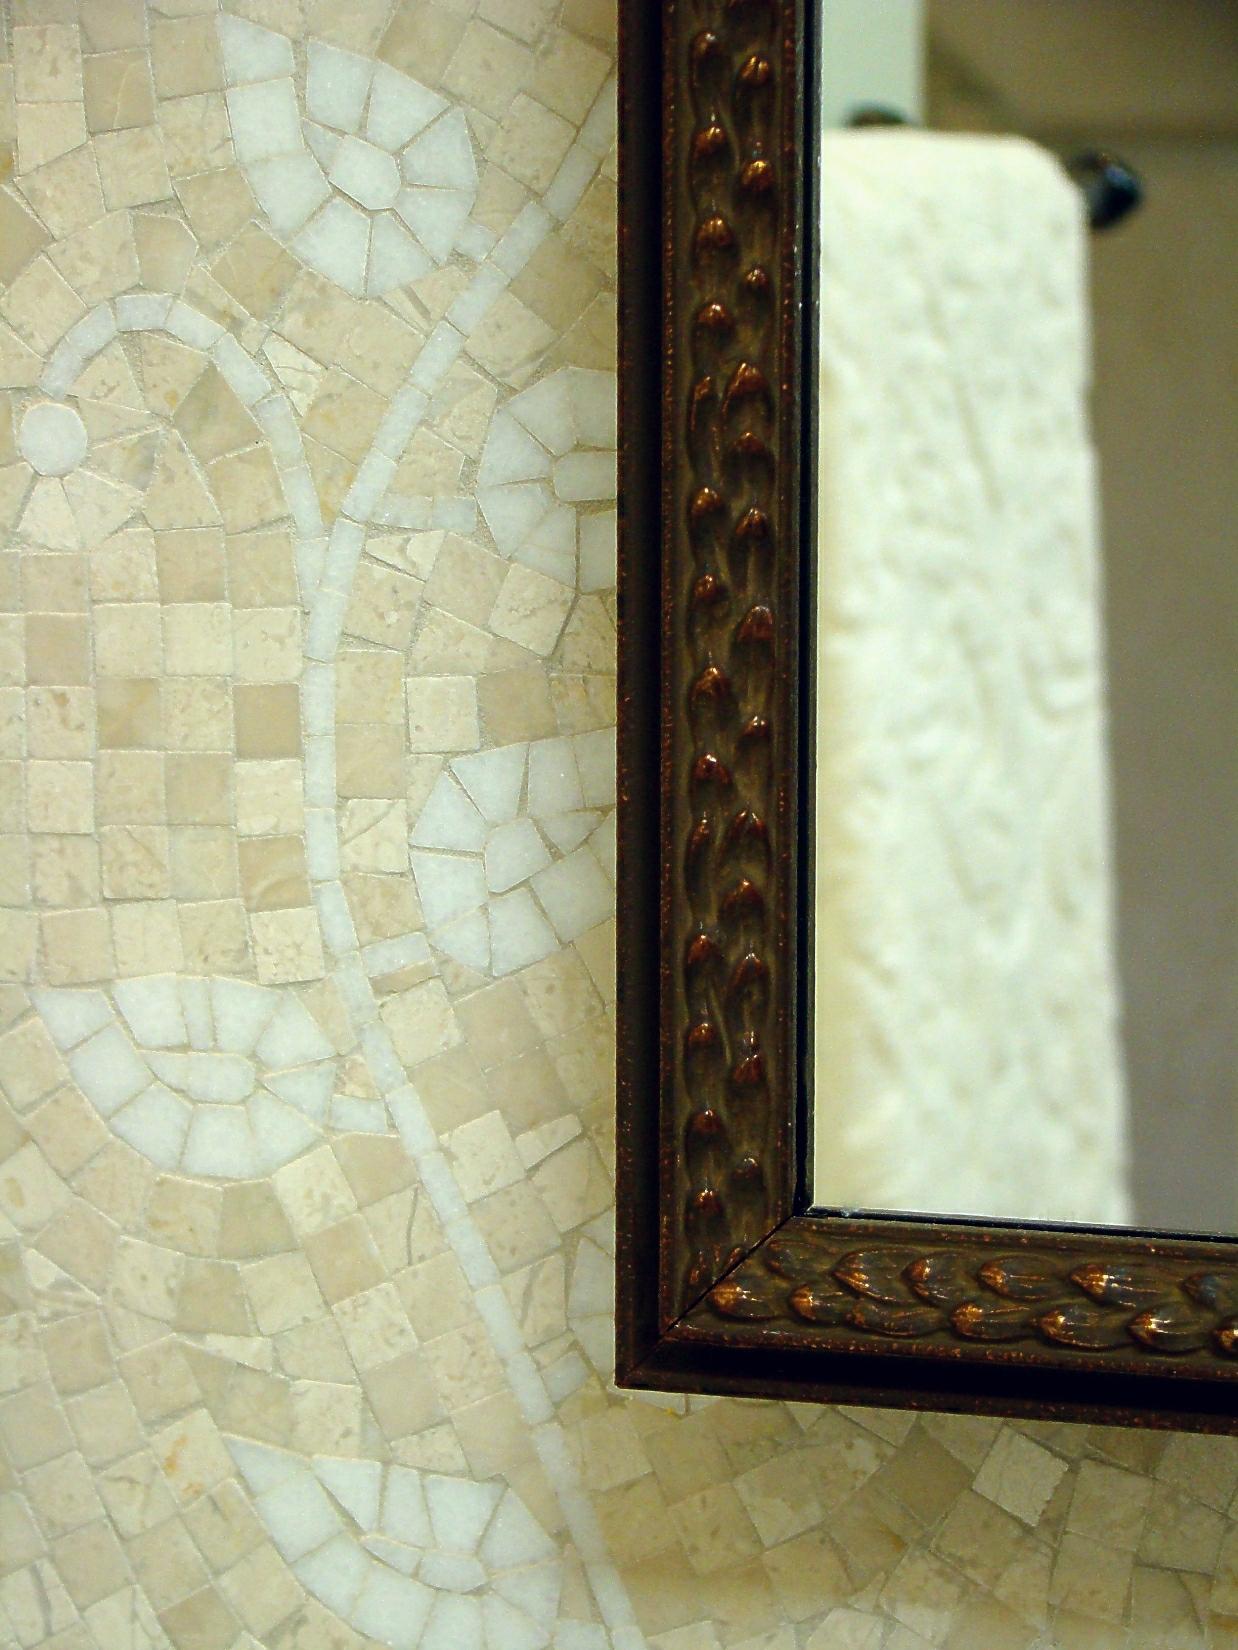 Fiorito Interior Design, interior design, remodel, master bathroom, mosaic tile, mirror frame, traditional